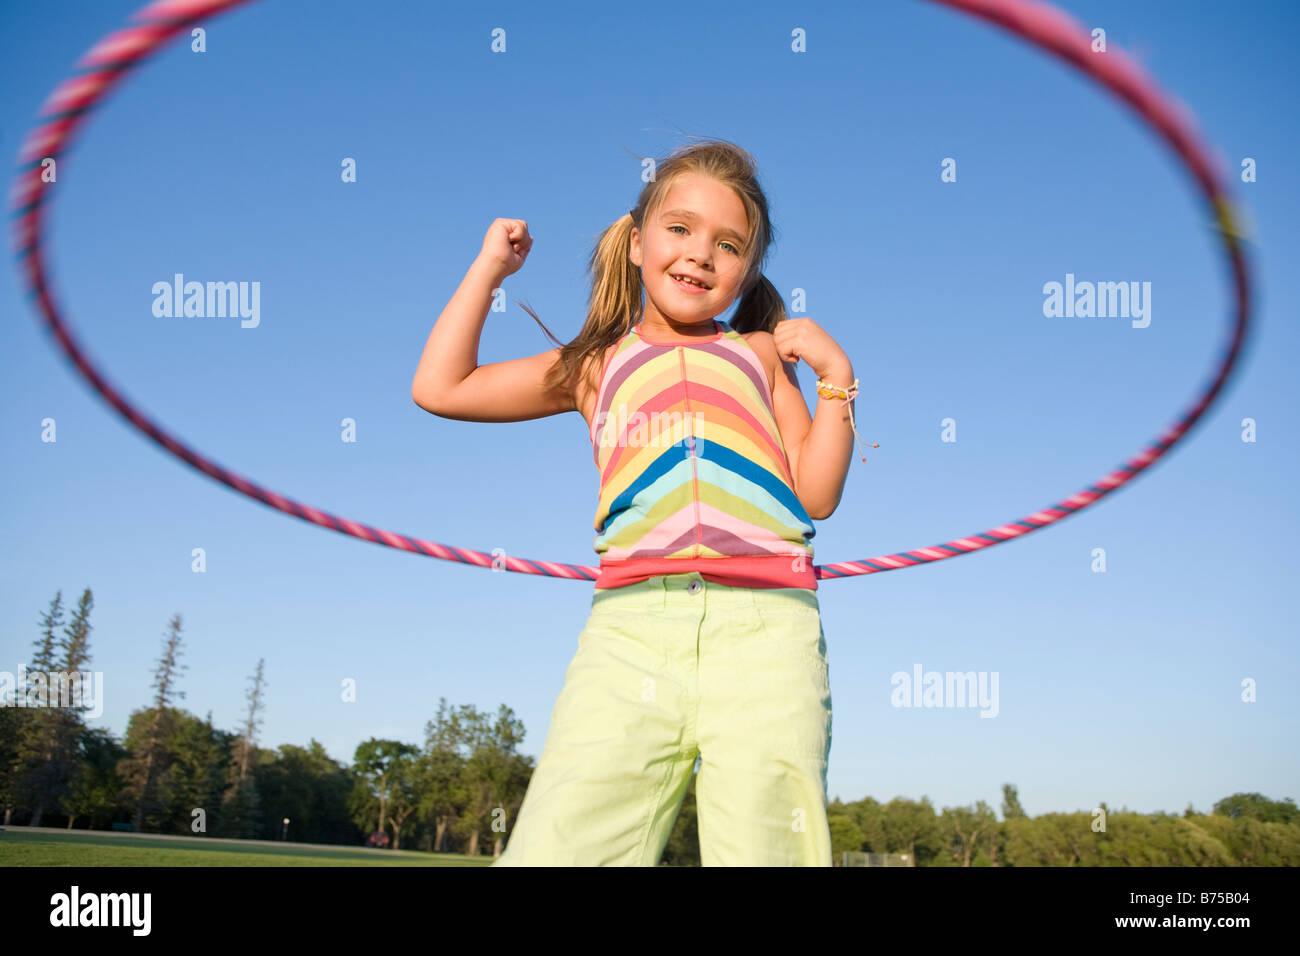 6 year old girl playing with hula hoop, Winnipeg, Manitoba, Canada - Stock Image